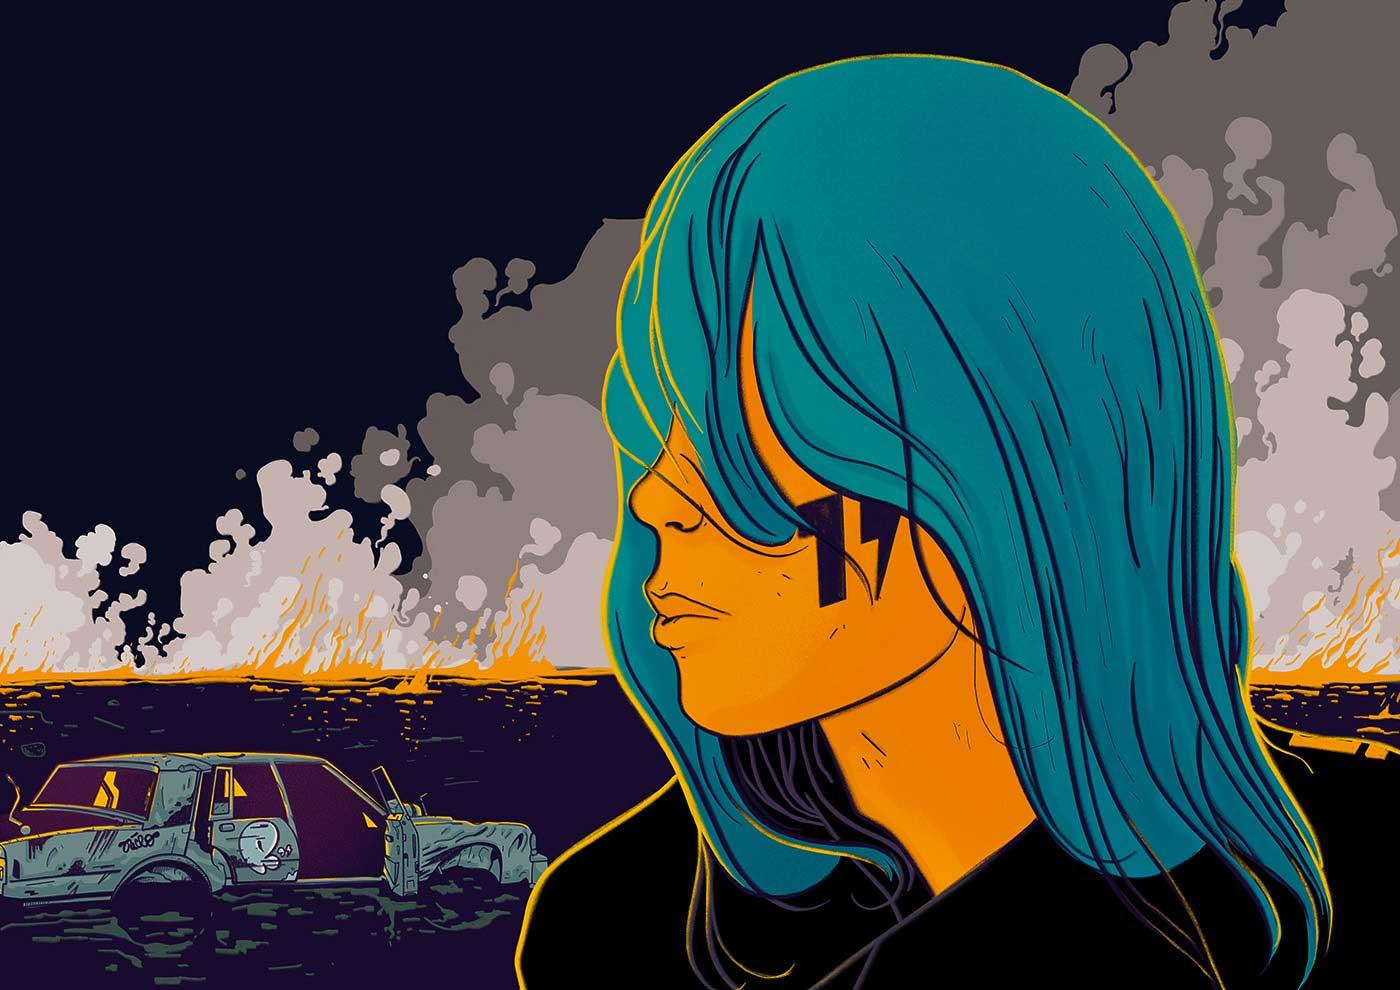 Illustration: Gabriel Suchowolski Gabriel-Suchowolski-illustration_05